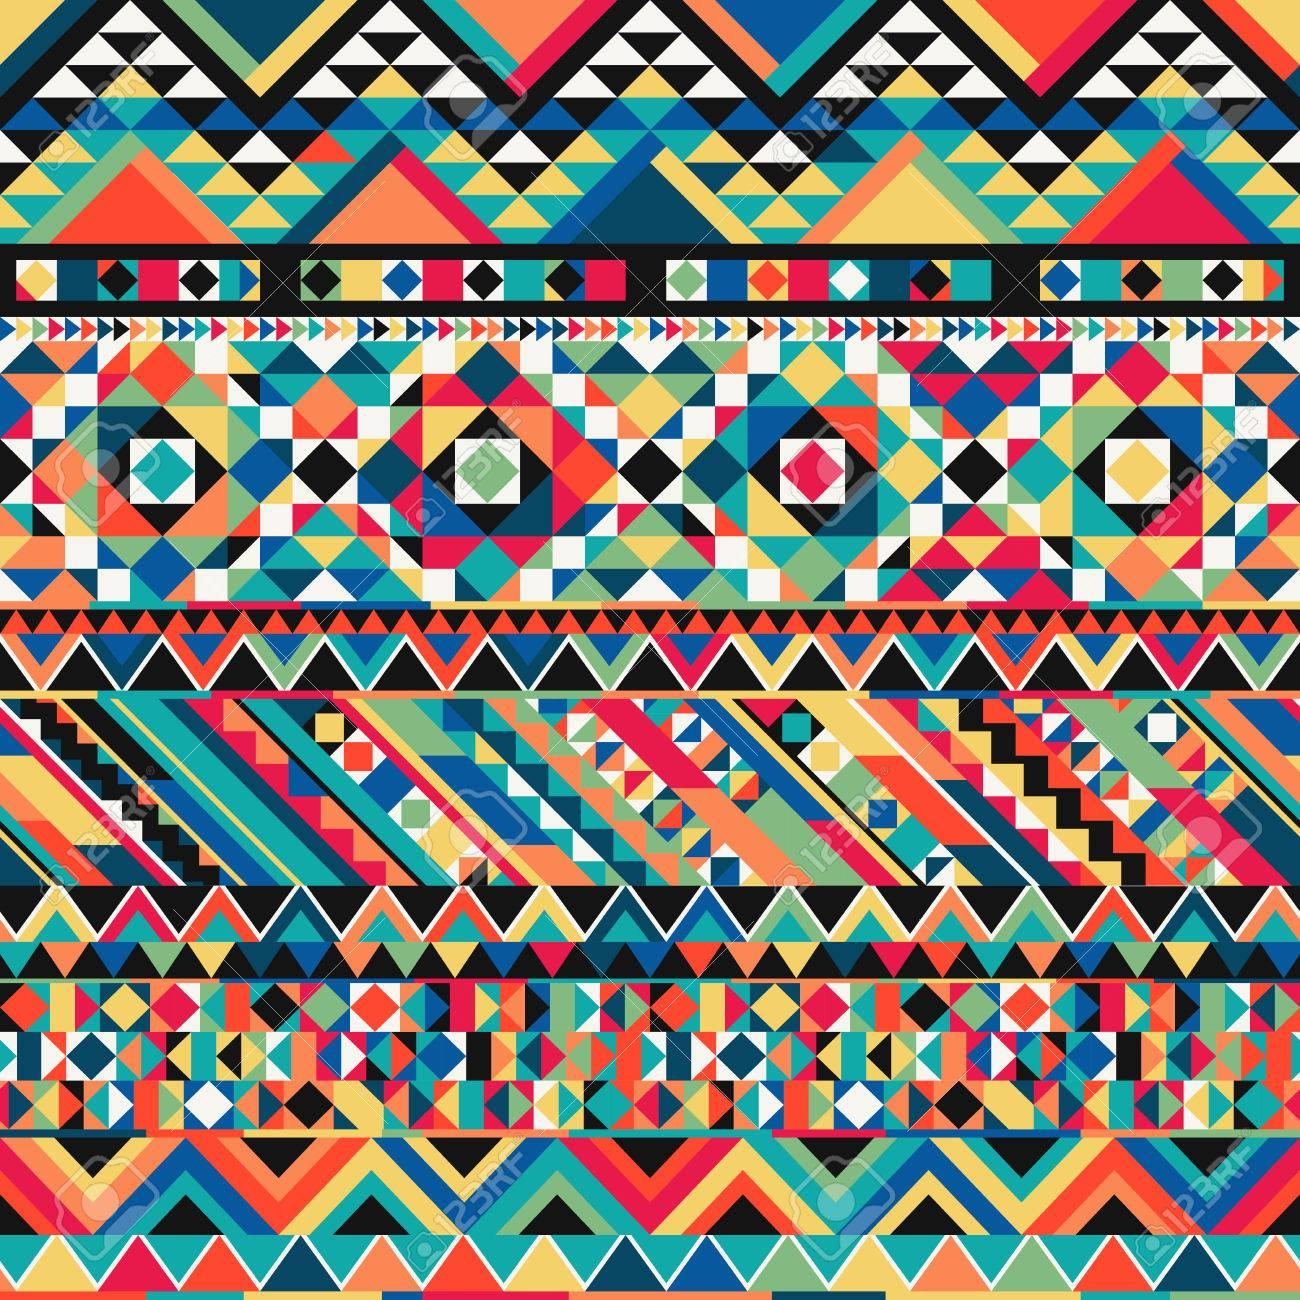 Azteca Antiguo De La Tela De Colores Fondo Ornamental Textil